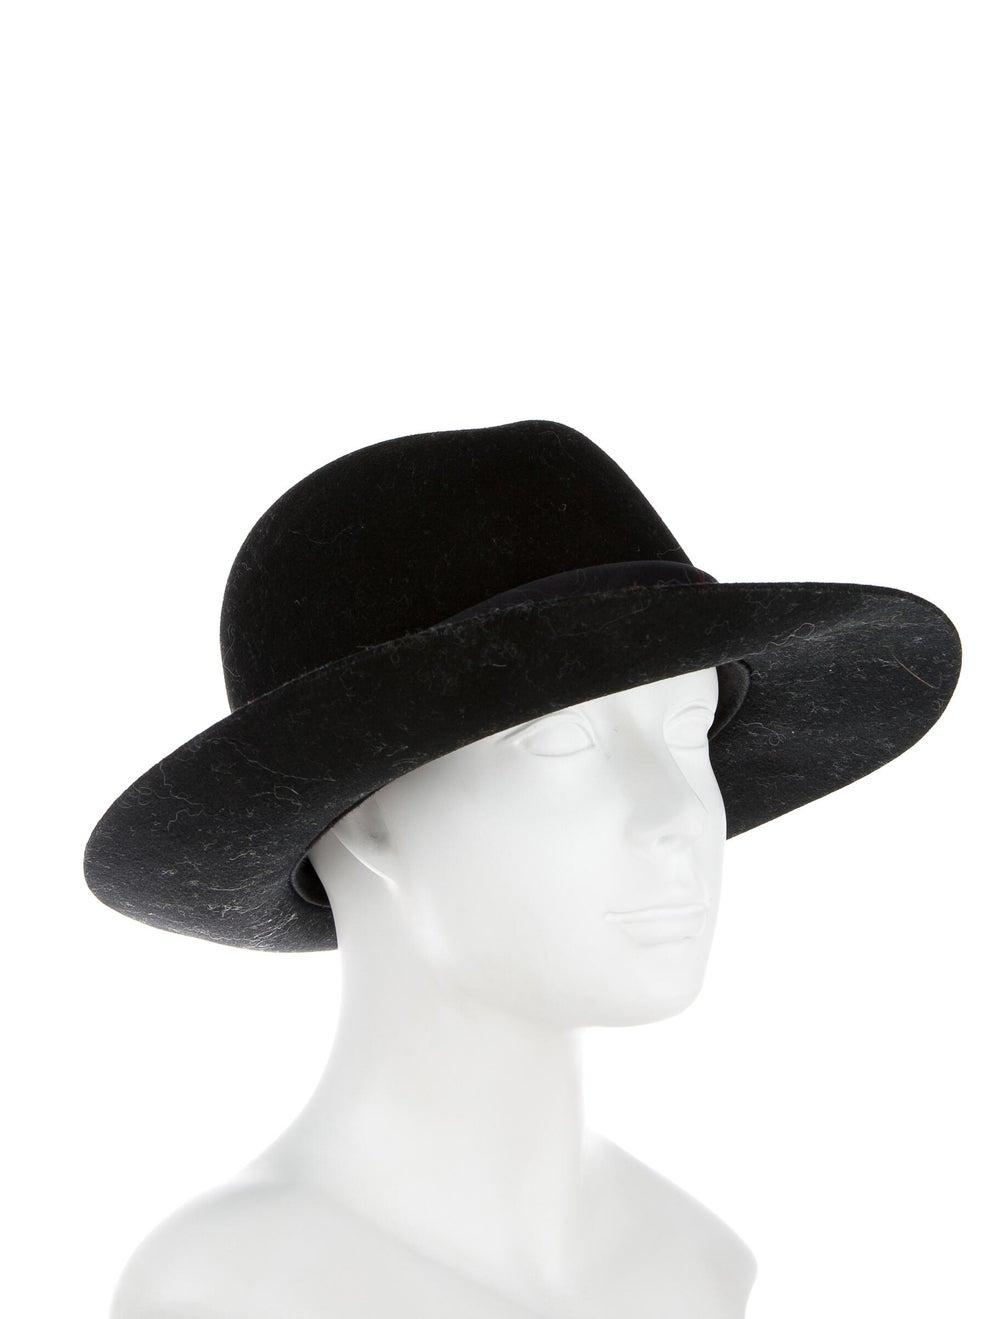 Rag & Bone Wool Fedora Hat Black - image 3